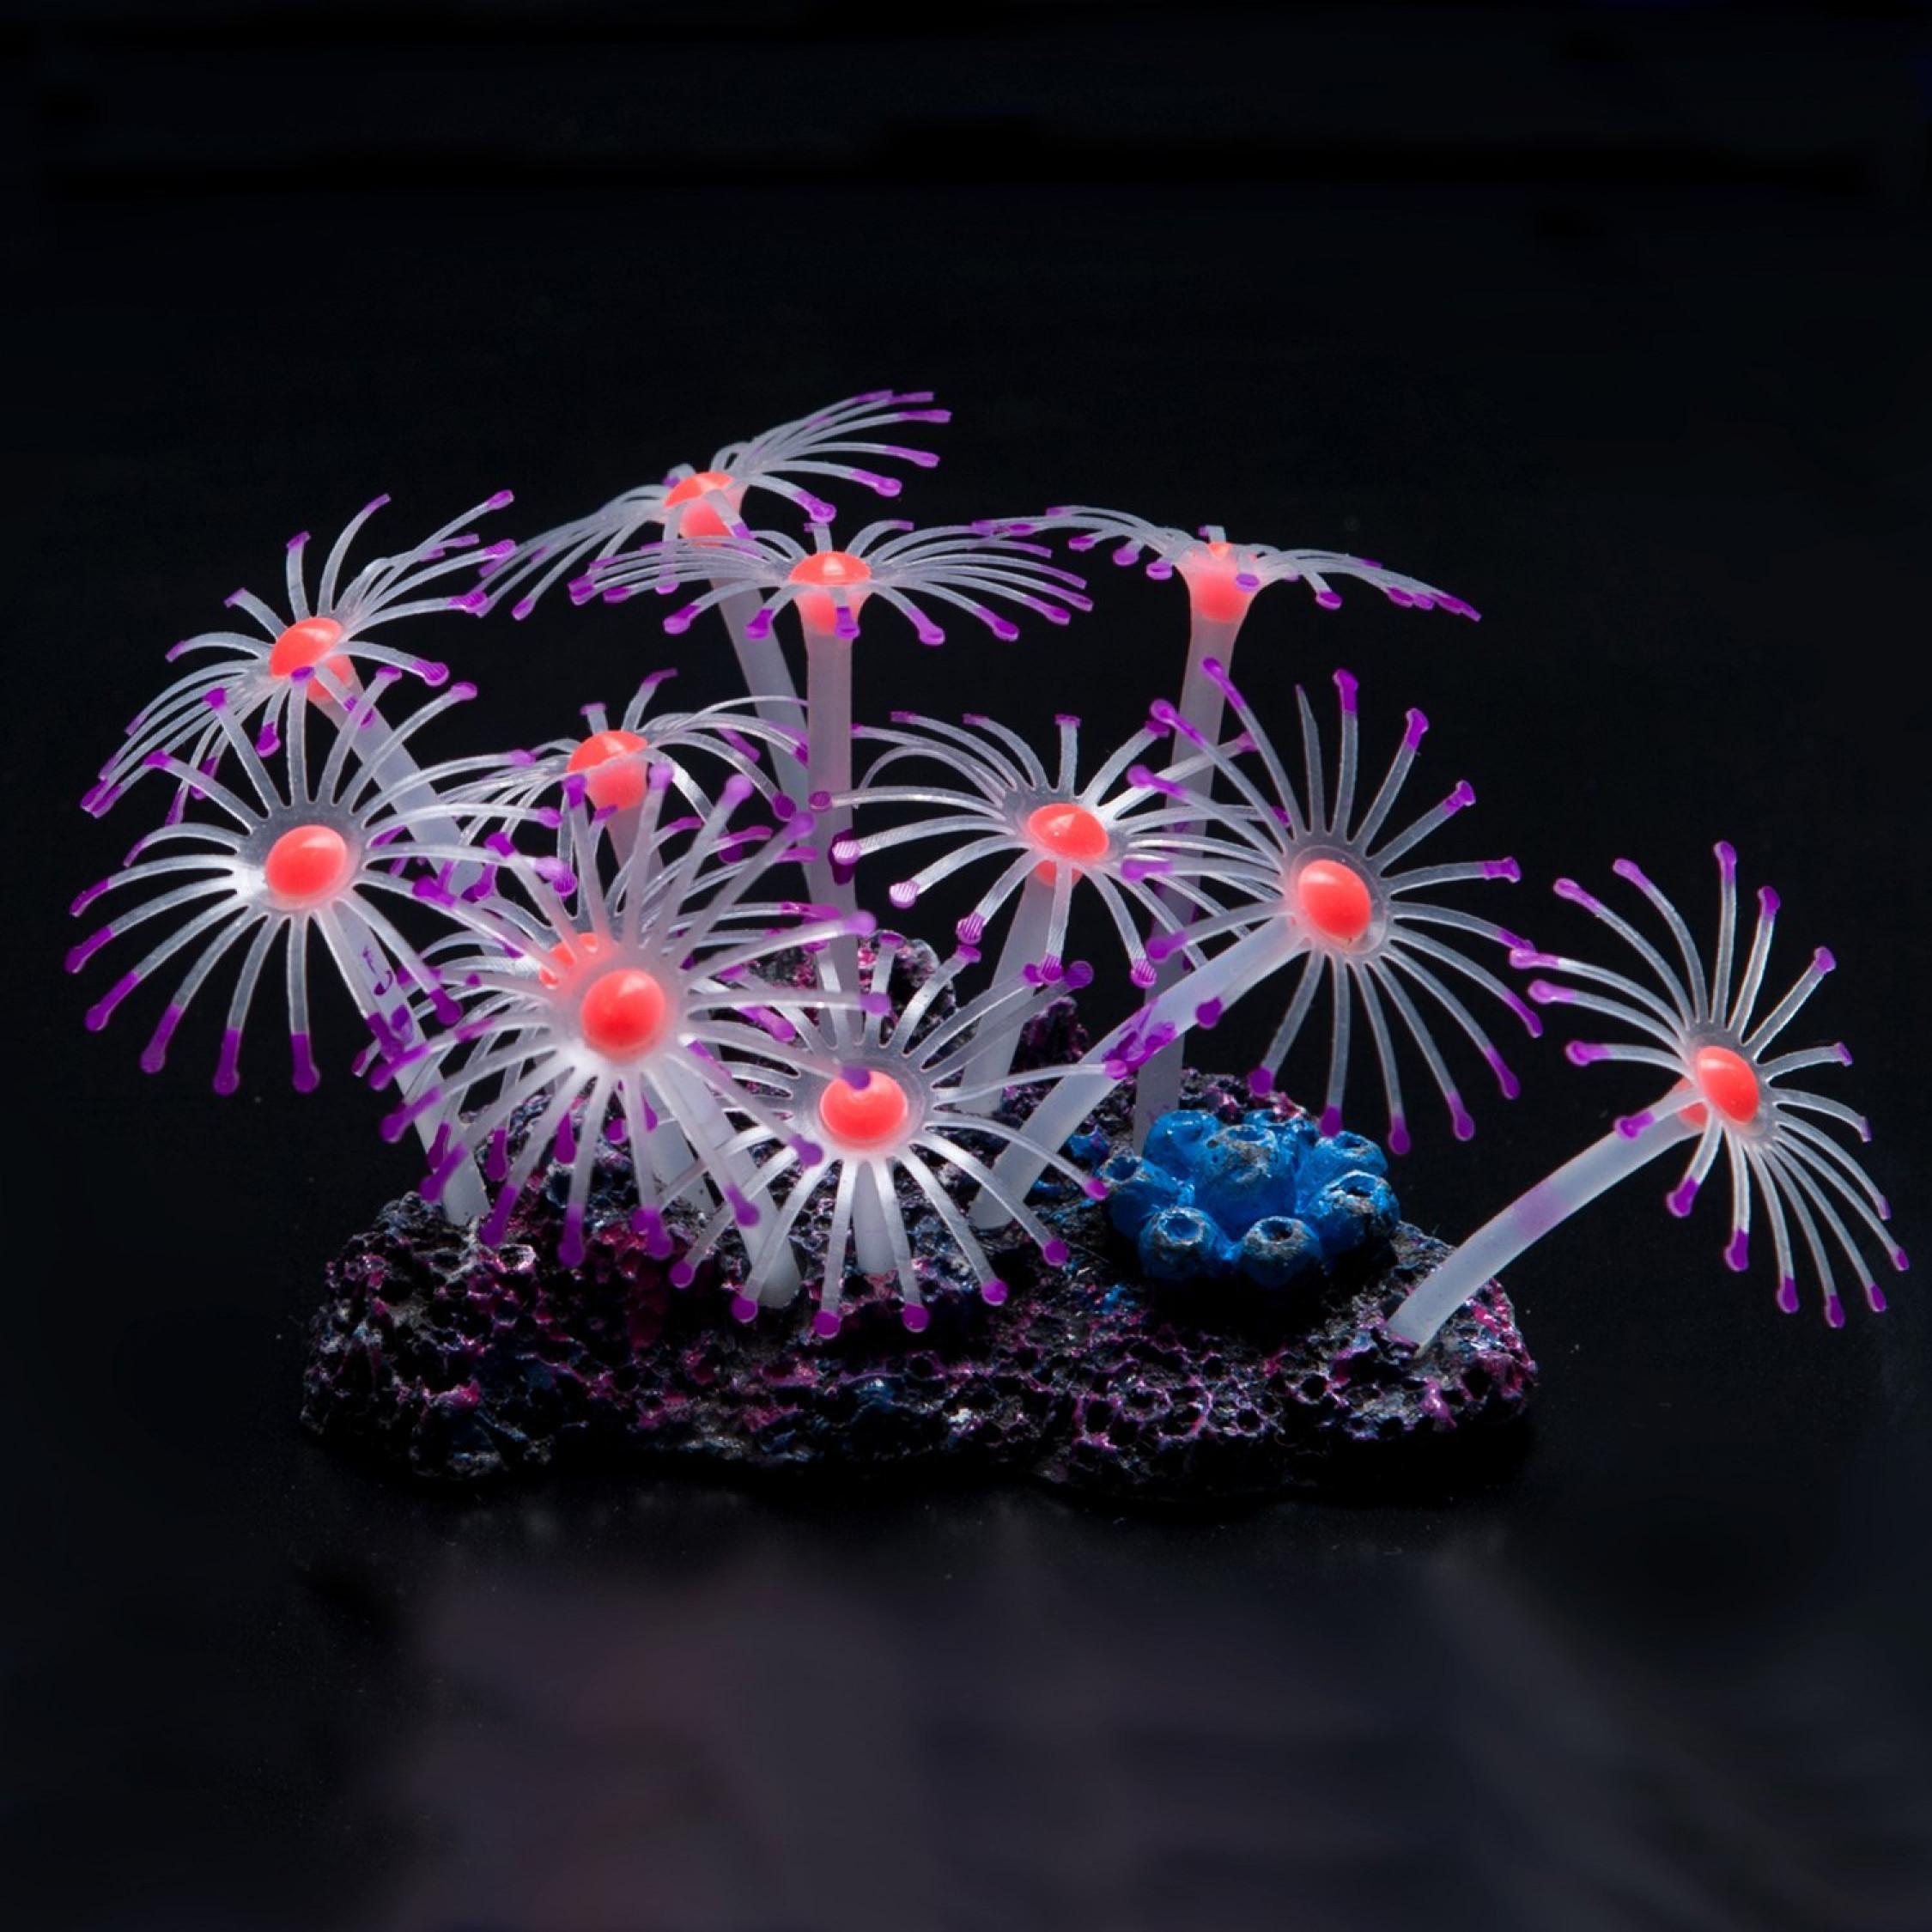 Artificial aquarium fish tank - Image Is Loading Glowing Artificial Coral Plant Fish Tank Aquarium Realistic